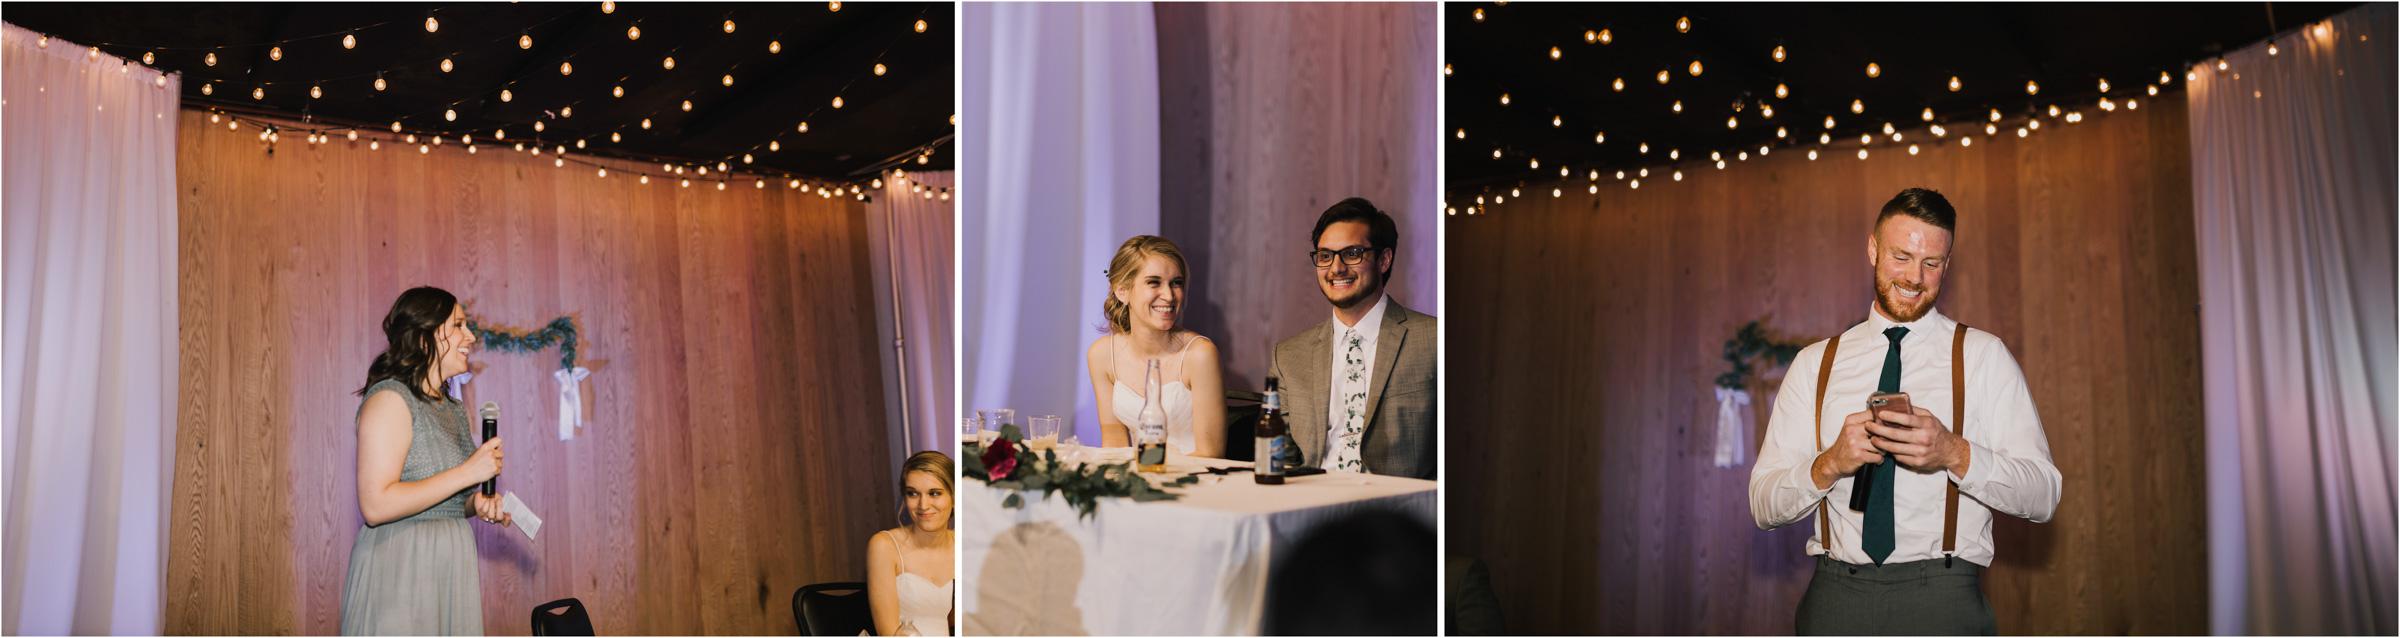 alyssa barletter photography midtown kansas city wedding el torreon kcmo fall october wedding photography-49.jpg